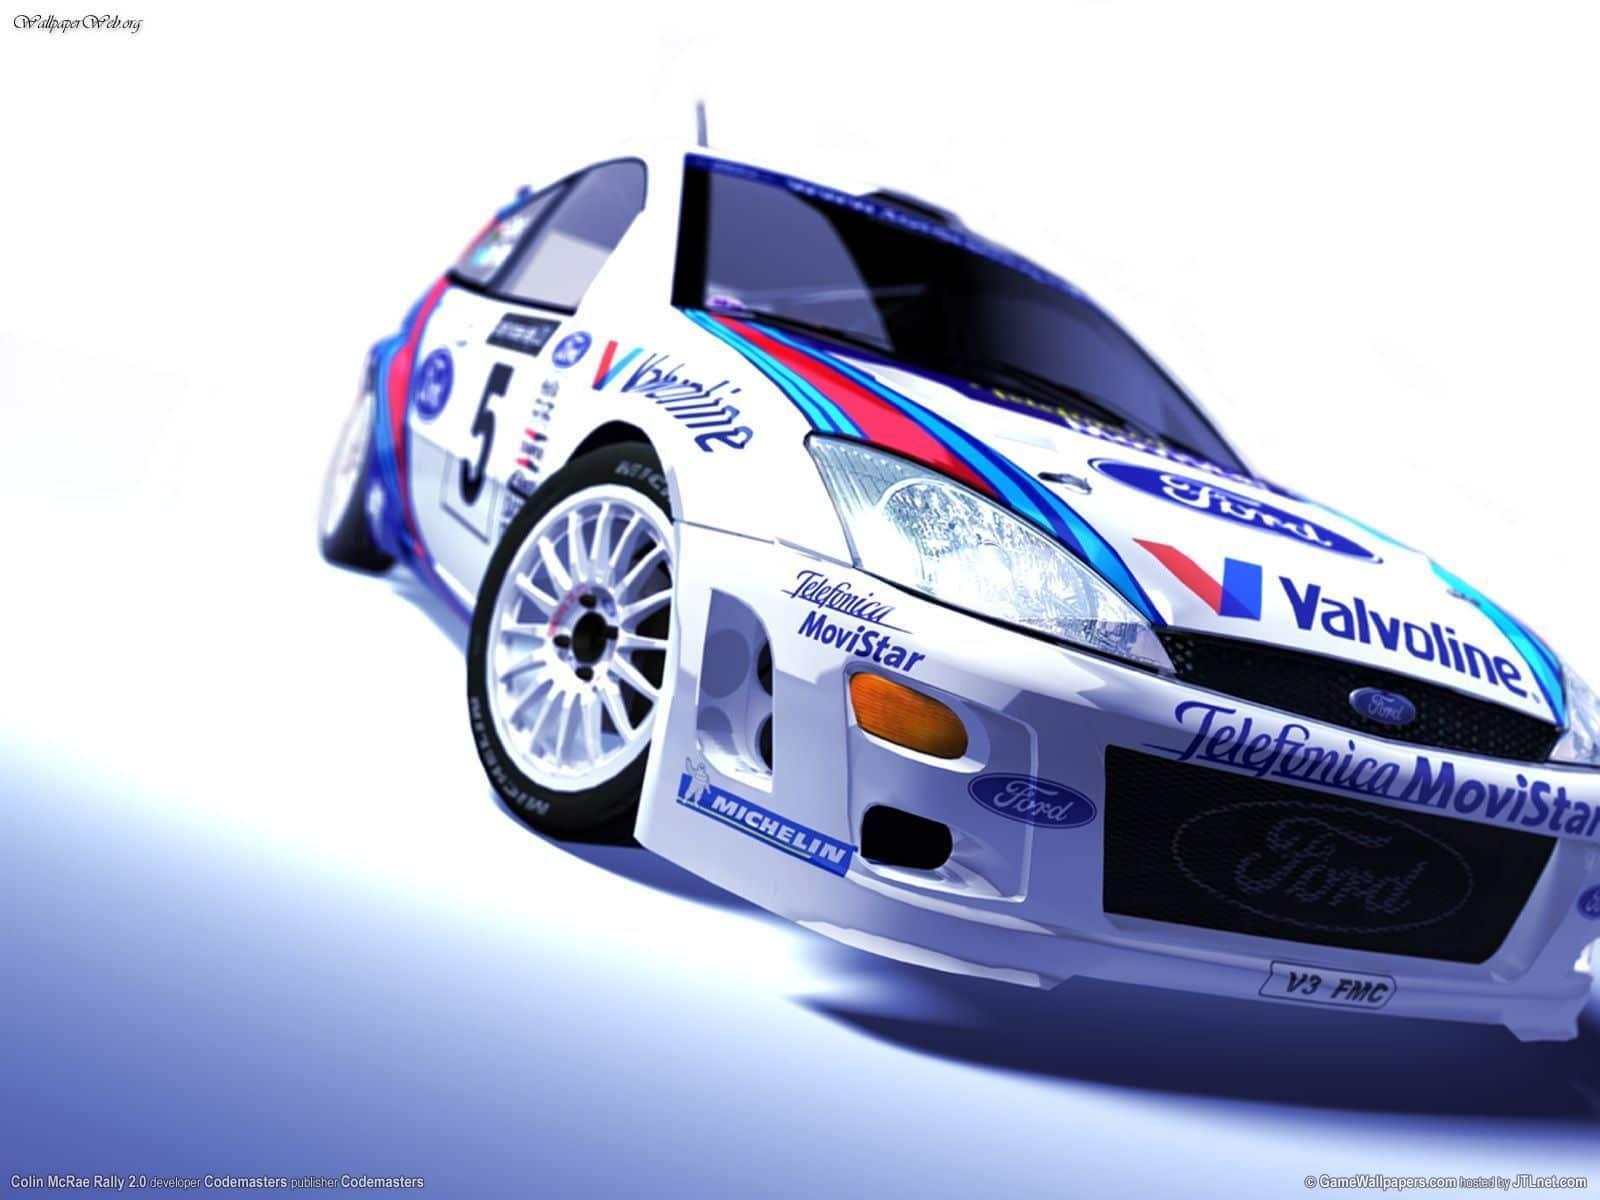 Colin Mcrae Rally لعبة سباقات رالى السيارات للأندرويد